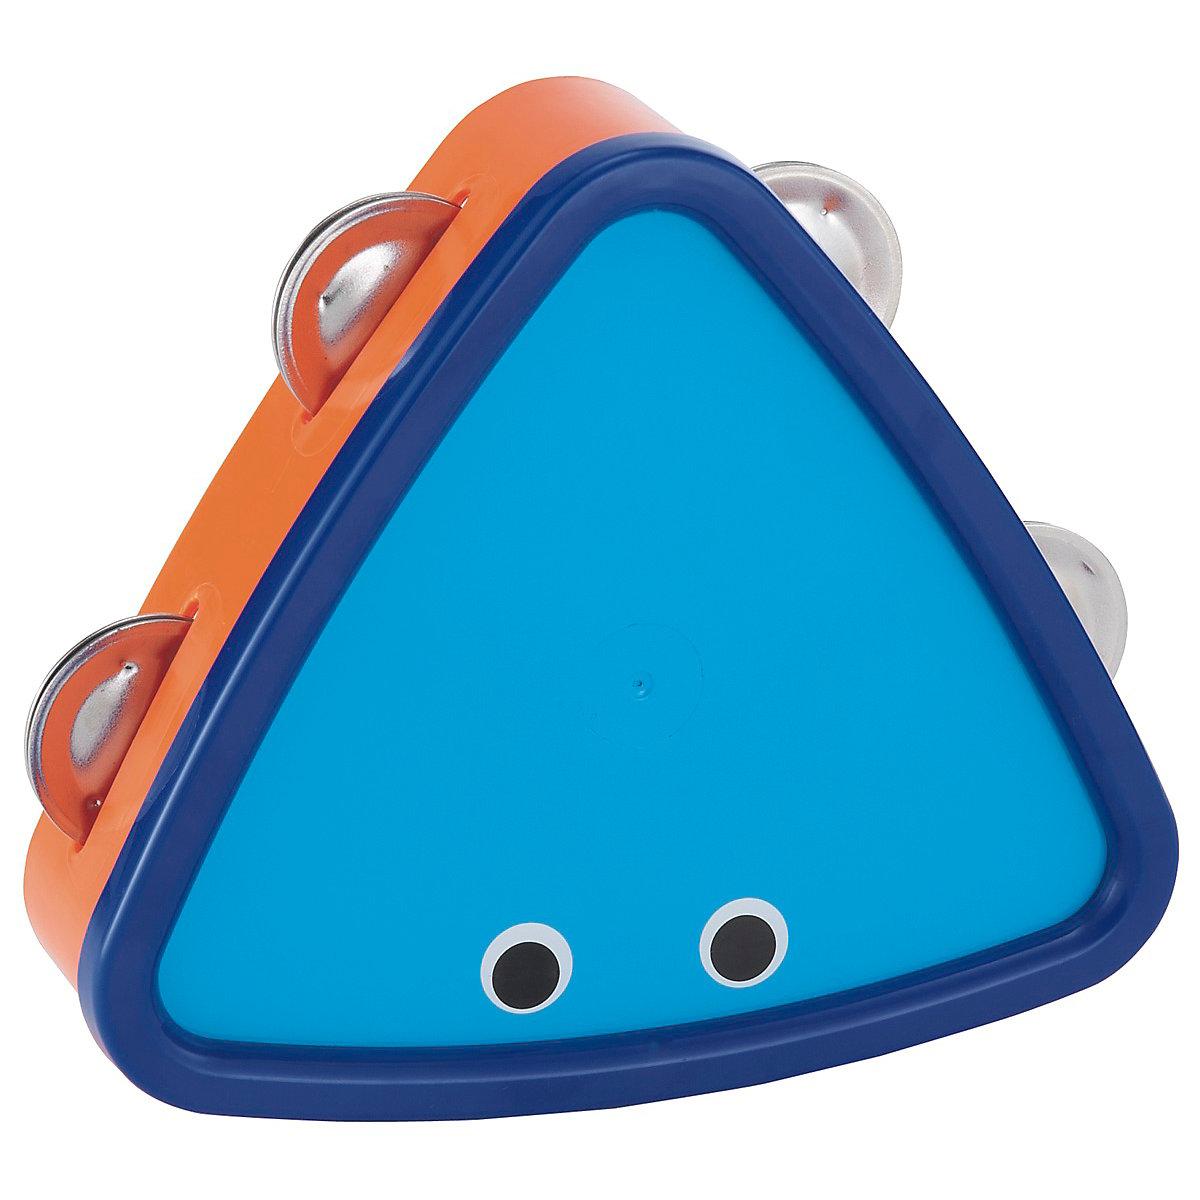 Tambourine Toy From 3 years